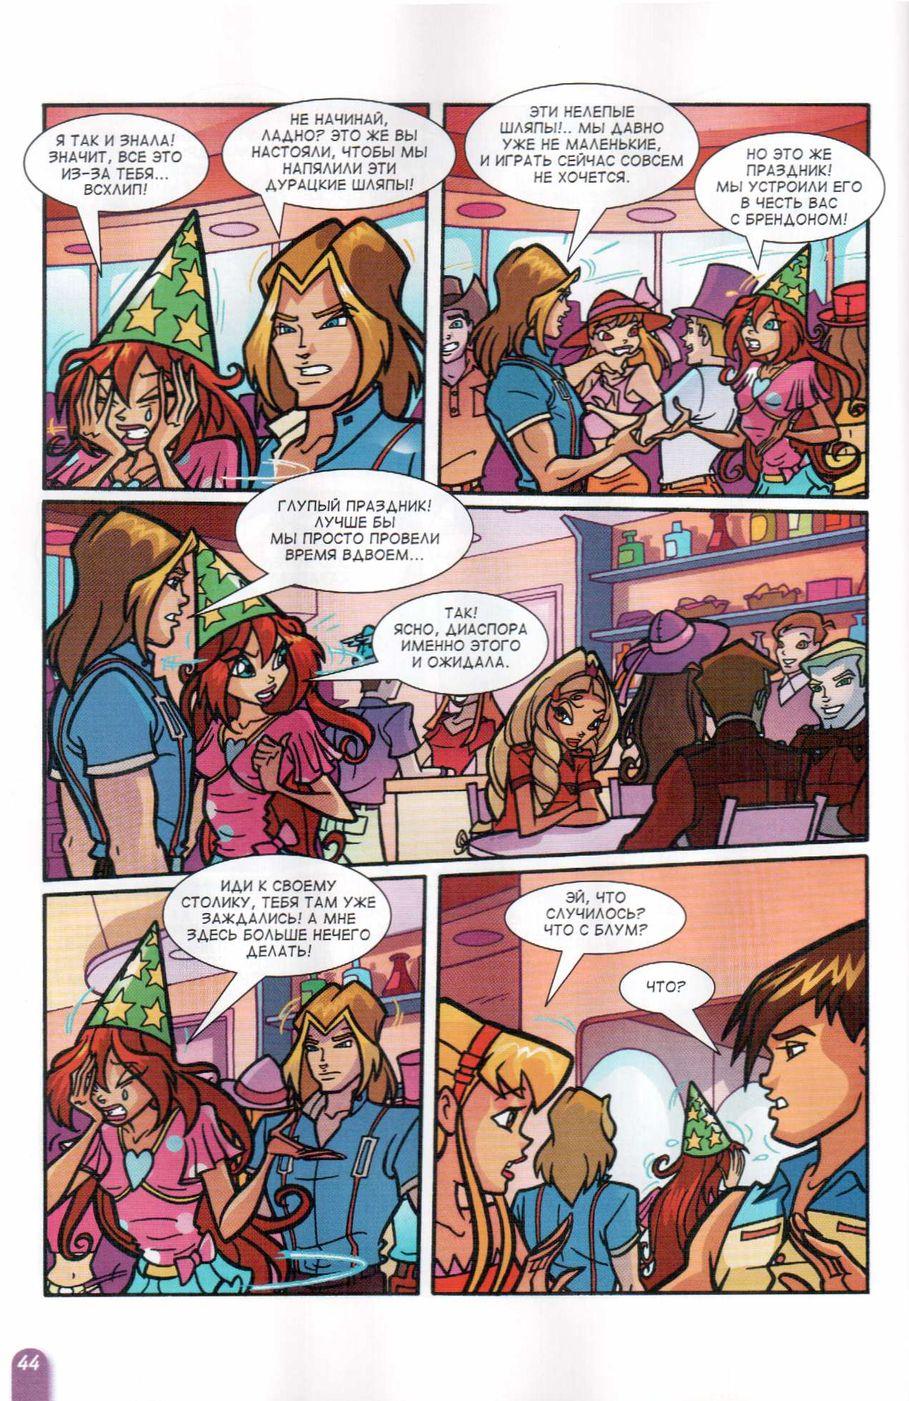 Комикс Винкс Winx - Любовь и ревность (Журнал Винкс №7 2011) - стр. 44